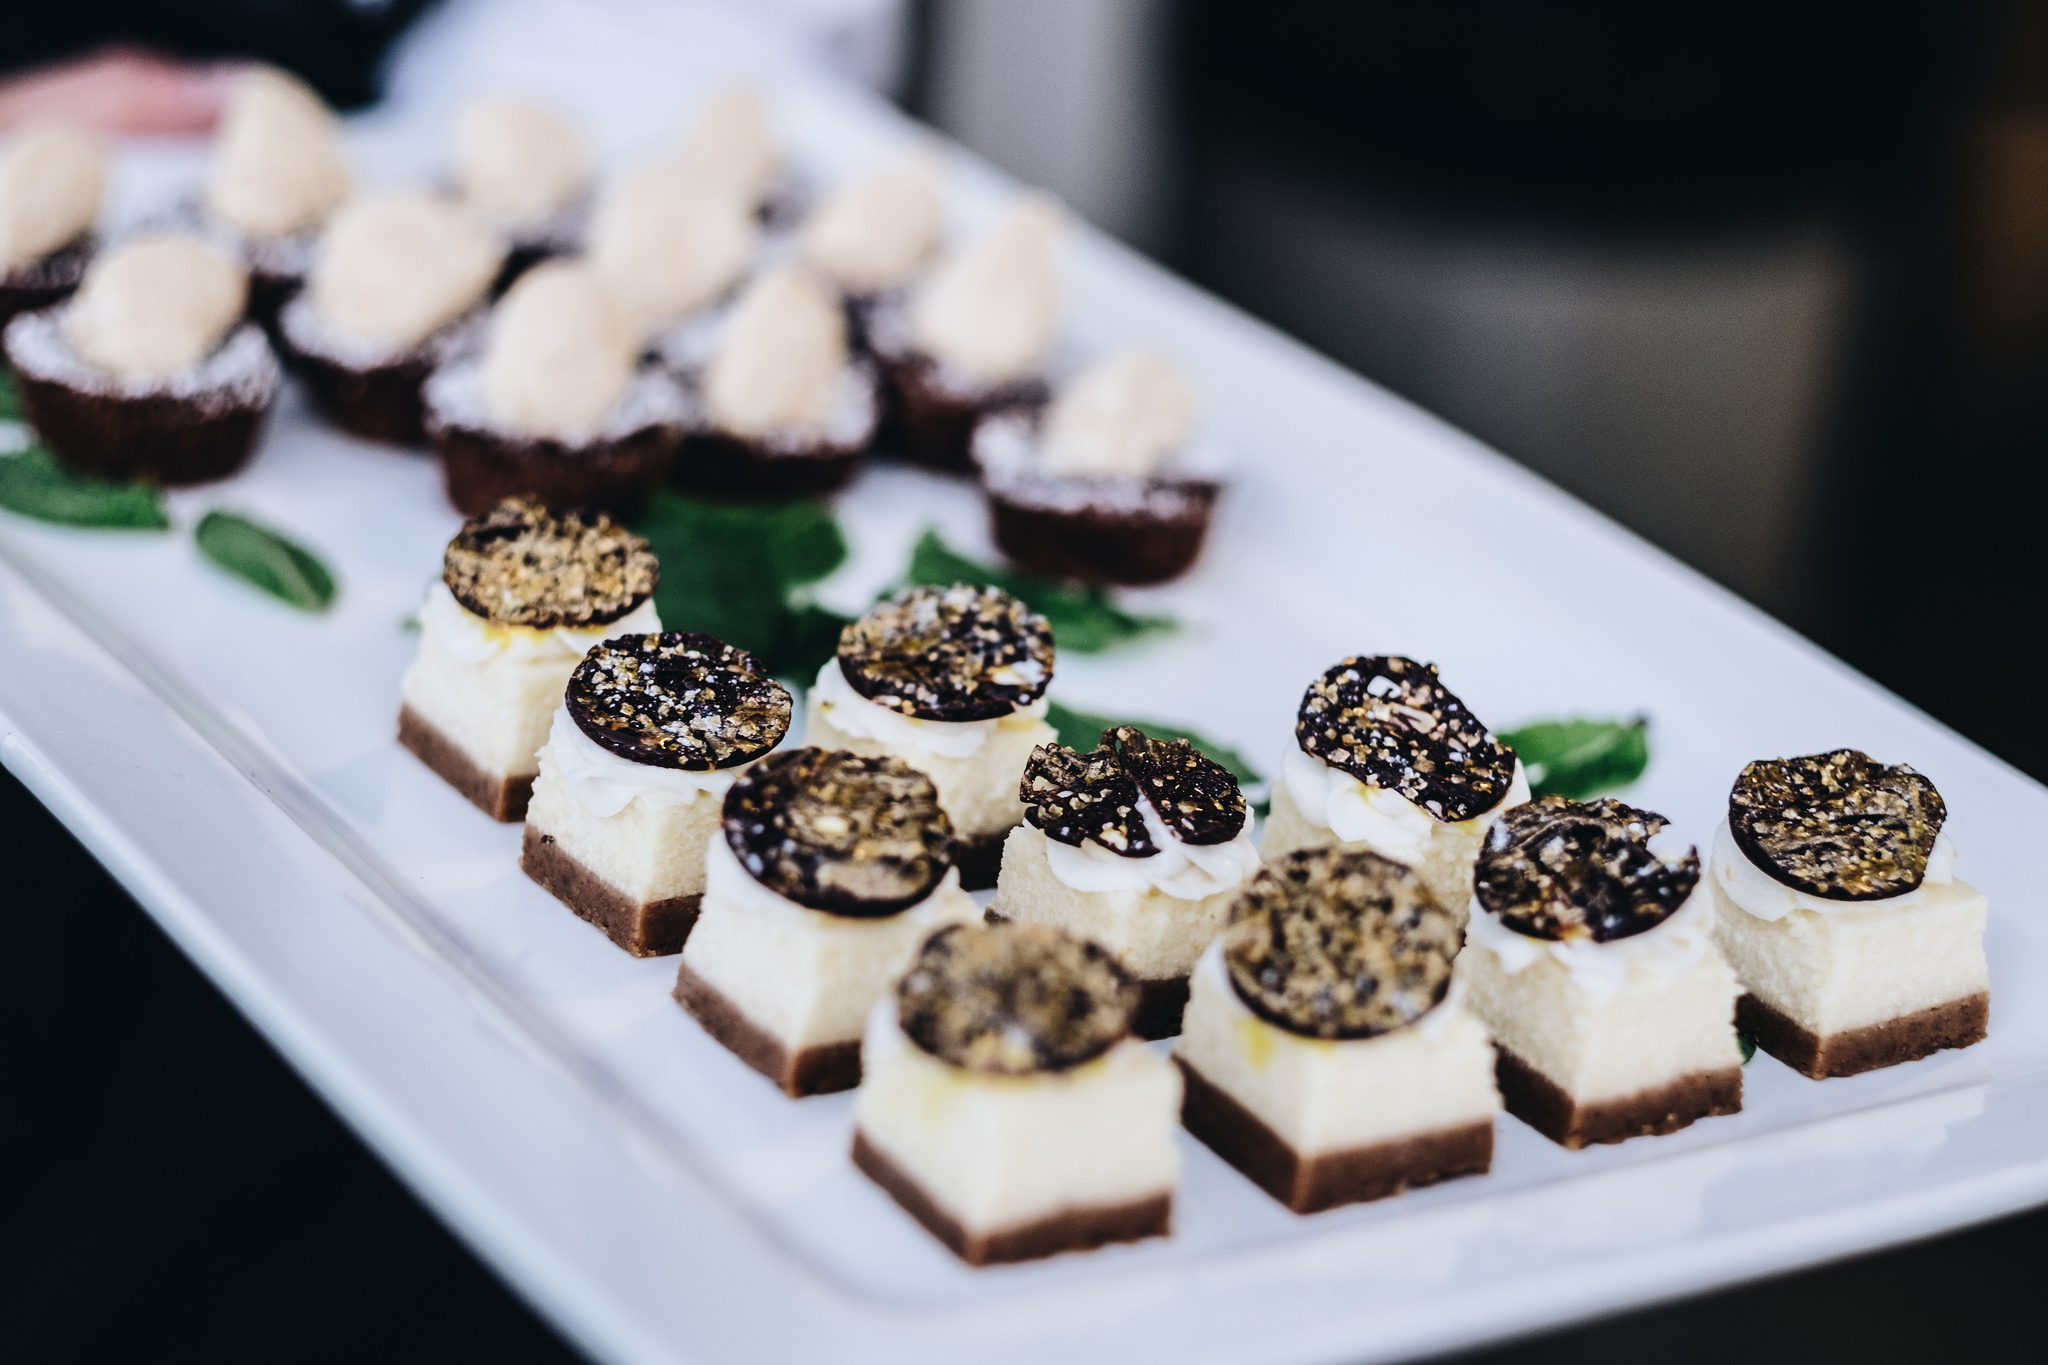 desserts6.jpg